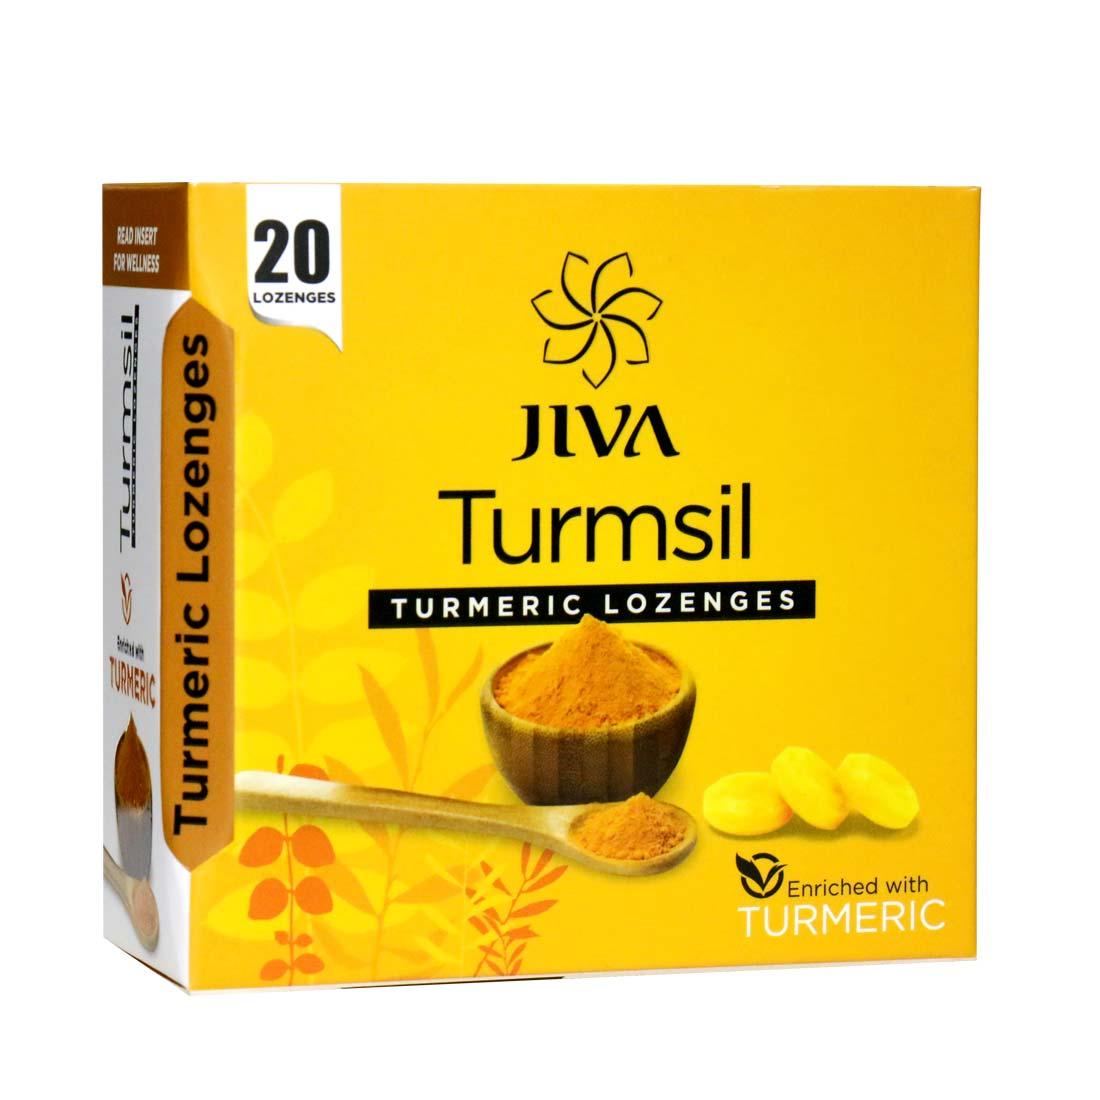 Jiva Store - Turmsil-Turmeric Lozenges